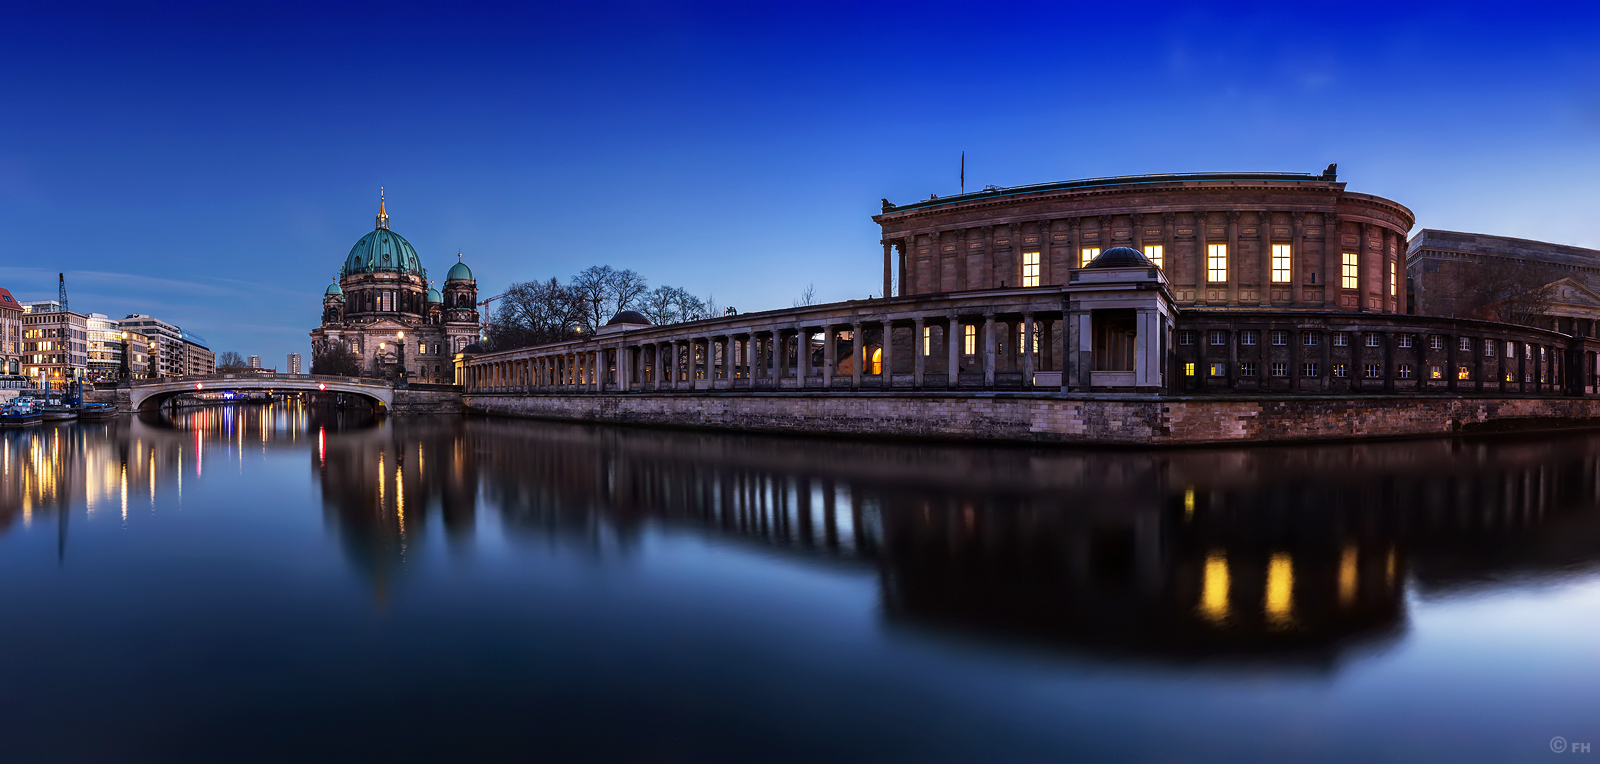 Museumsinsel_2015_P_k_3